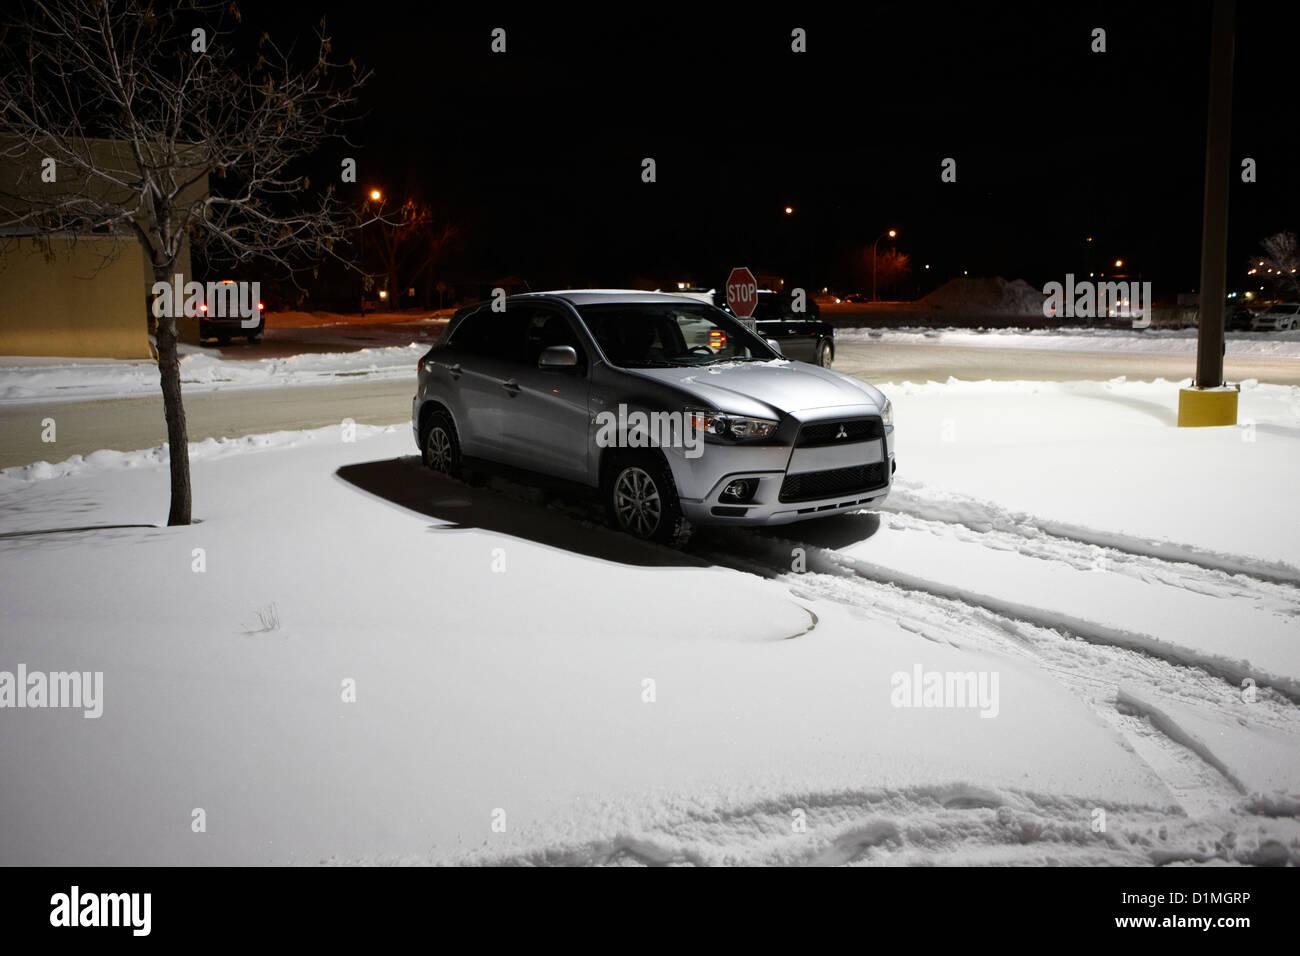 car parked in deepening snow in outdoor parking lot in Saskatoon Saskatchewan Canada - Stock Image